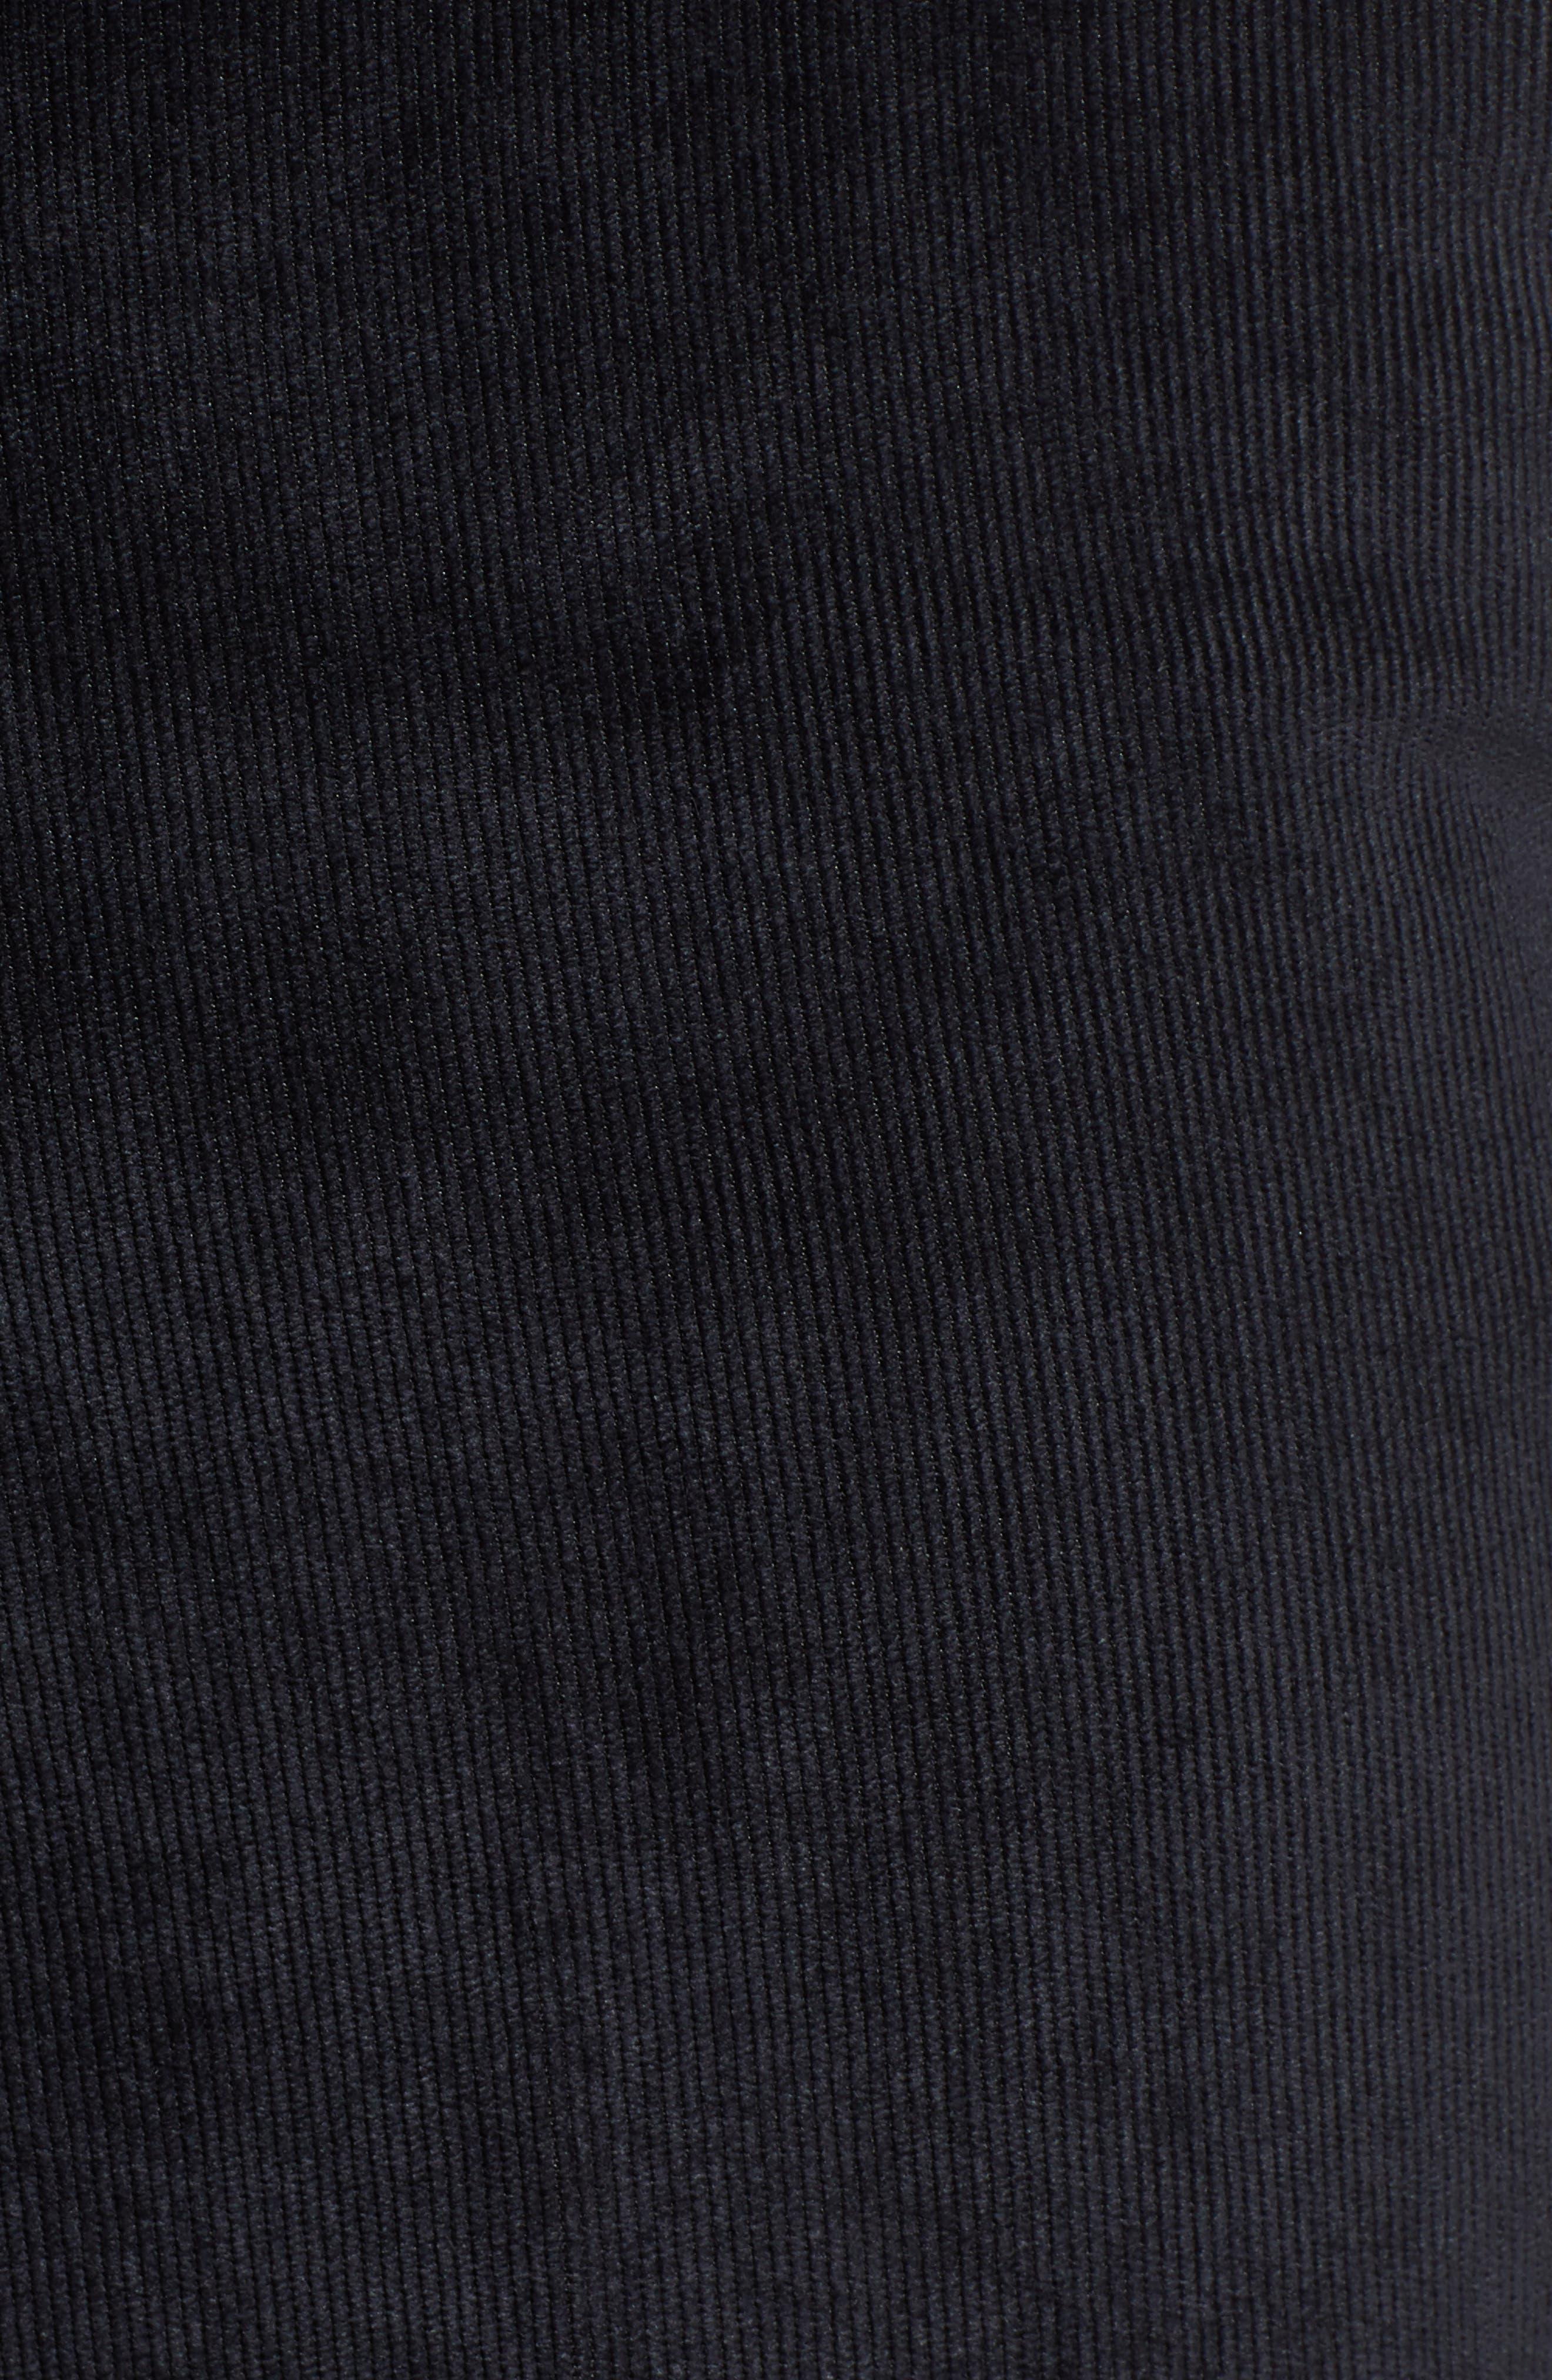 Classic Fit Flat Front Corduroy Trousers,                             Alternate thumbnail 5, color,                             BLACK